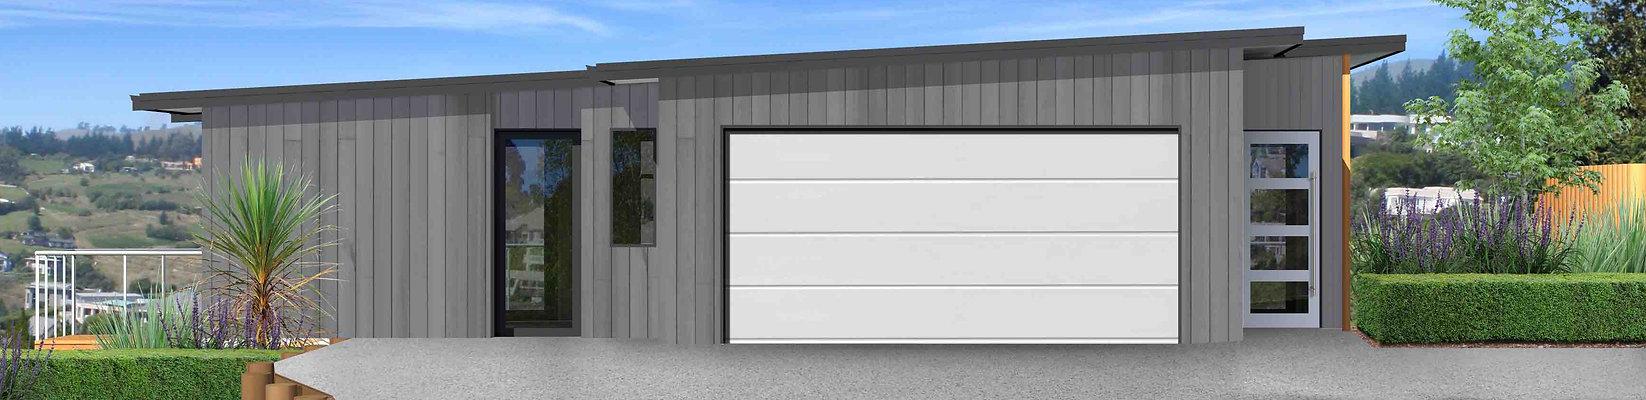 Advene House Lot 2-Front small.jpg